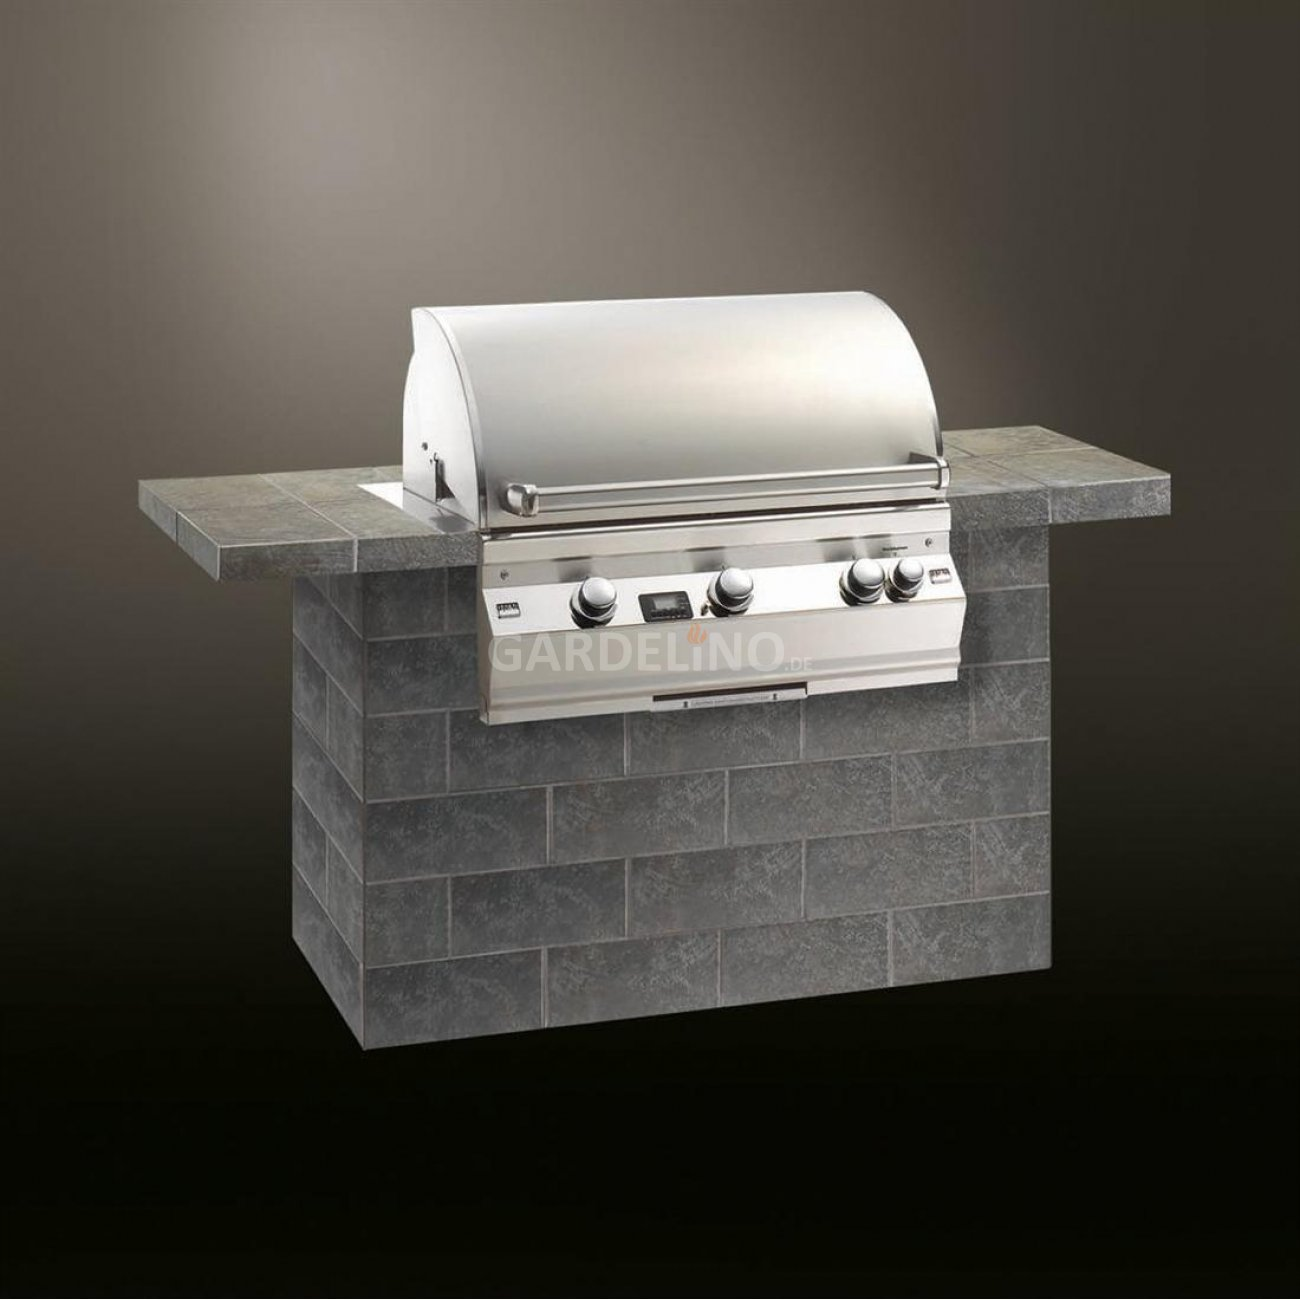 fire magic einbau gasgrill a540i. Black Bedroom Furniture Sets. Home Design Ideas